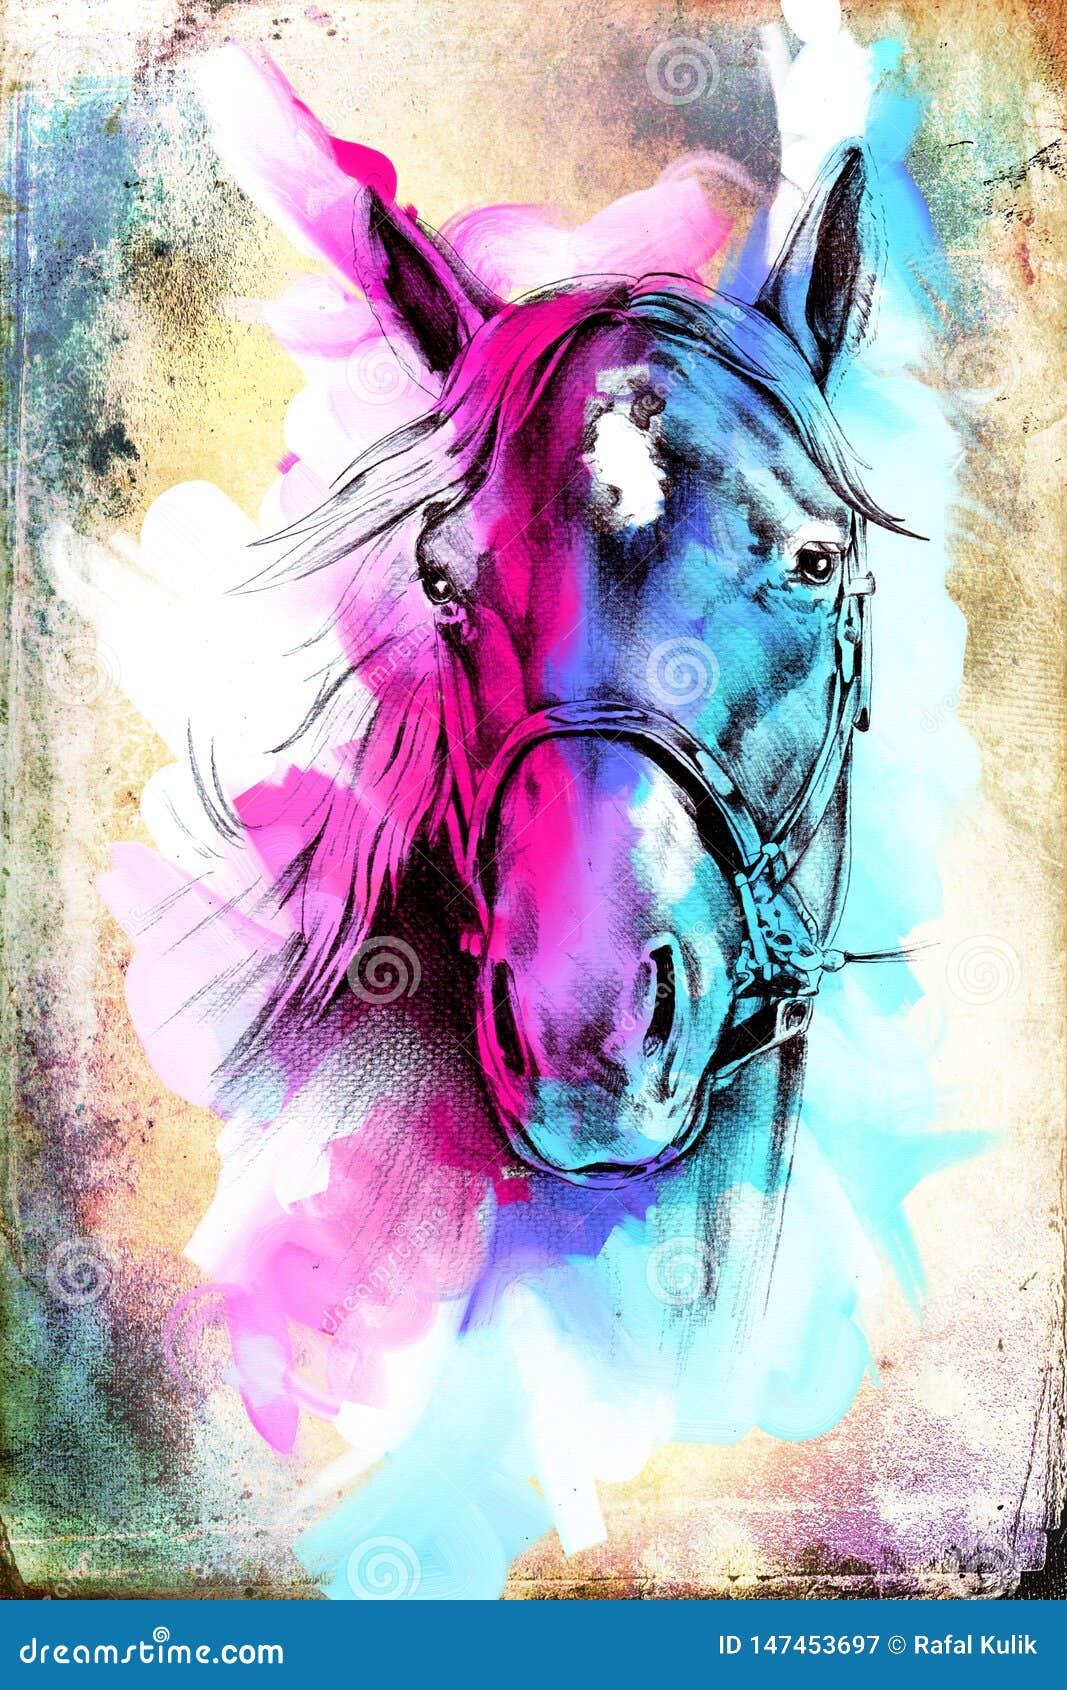 Original Oil Painting Of A Fine Arabian Horse Funny Artwork Stock Illustration Illustration Of Background Drawn 147453697